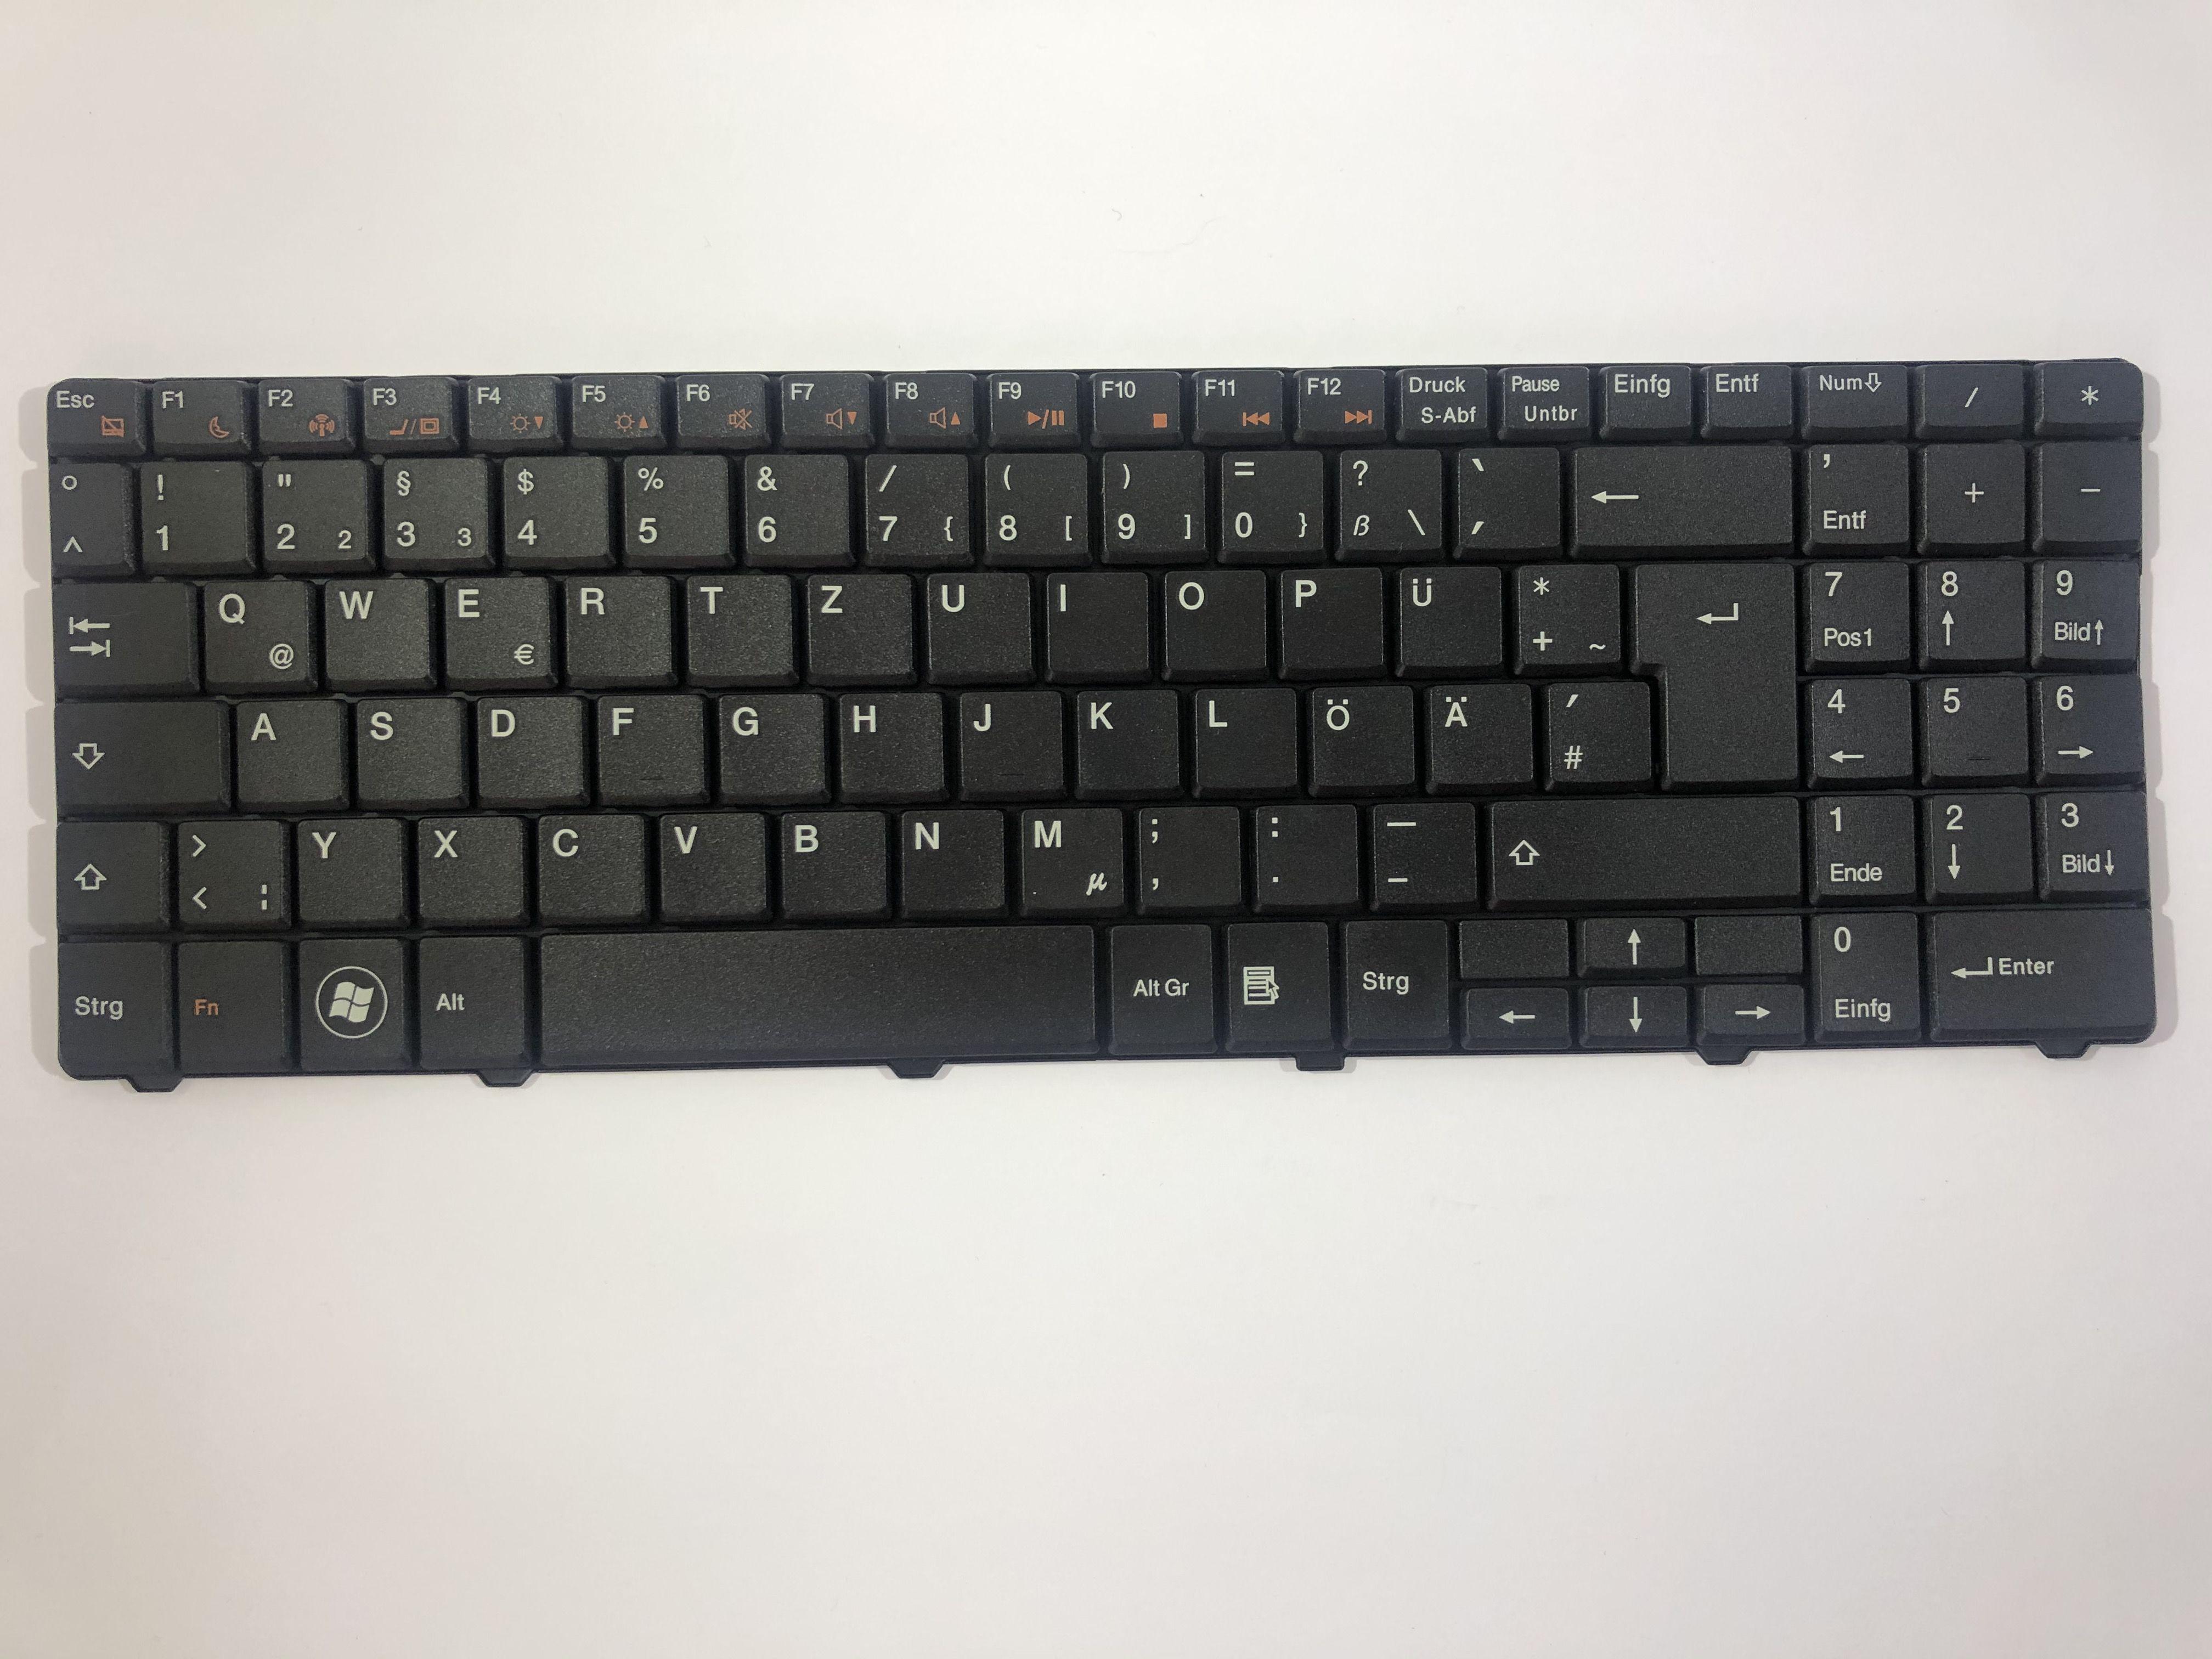 Tastatur Acer MP-08G66D0-6982 Acer 5241 5334 5516 5517 5532 5534 5541 E725 E527 E727 E525 E625 E627 E430 E628 E630